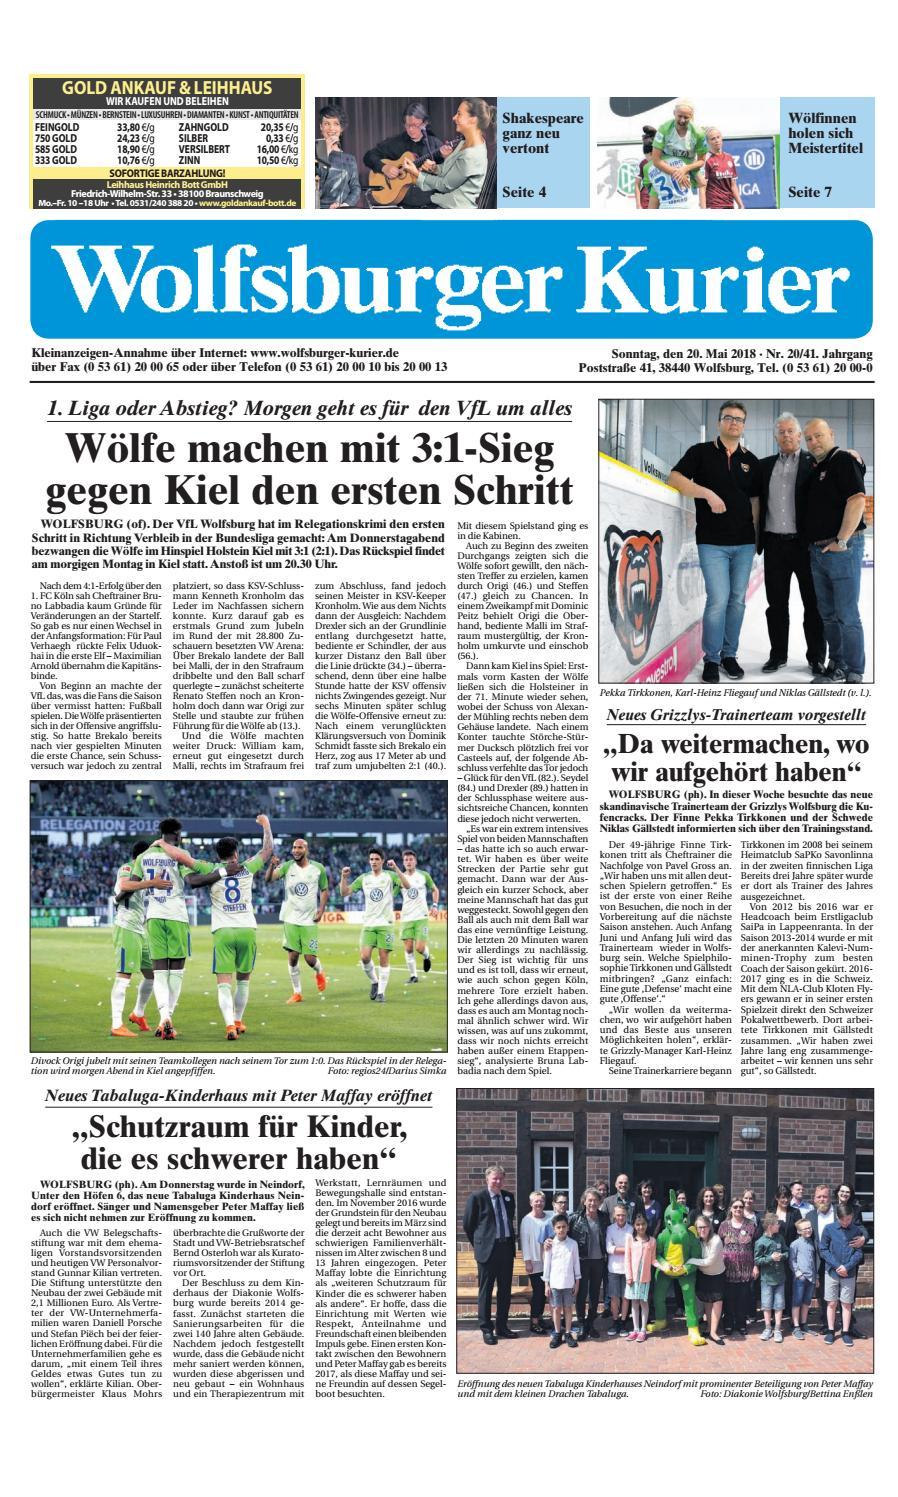 2018 05 20 by Wolfsburger Kurier issuu